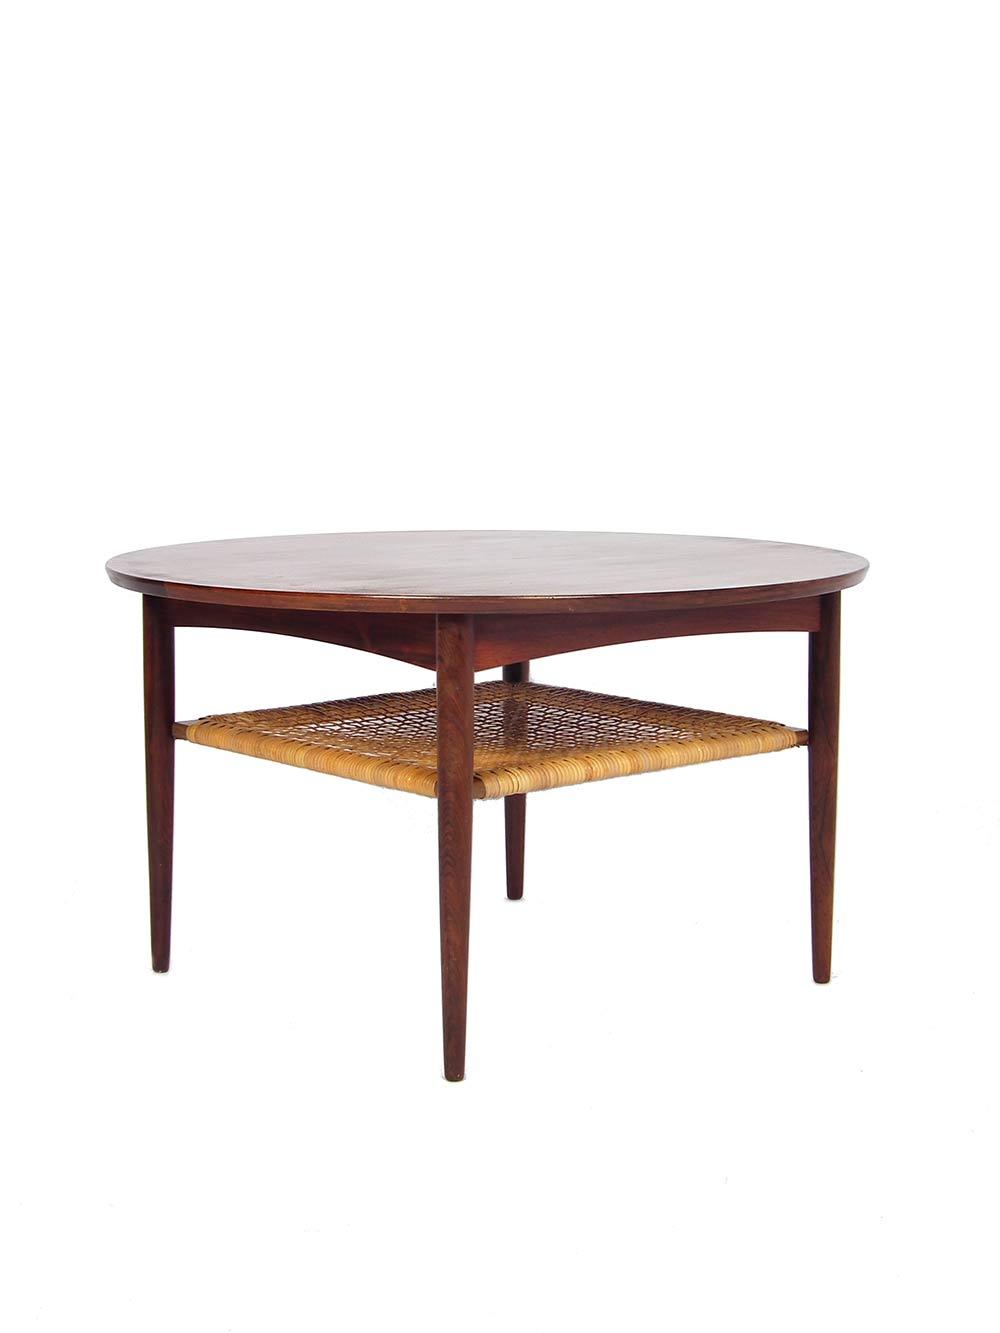 Rosewood danish design coffee table